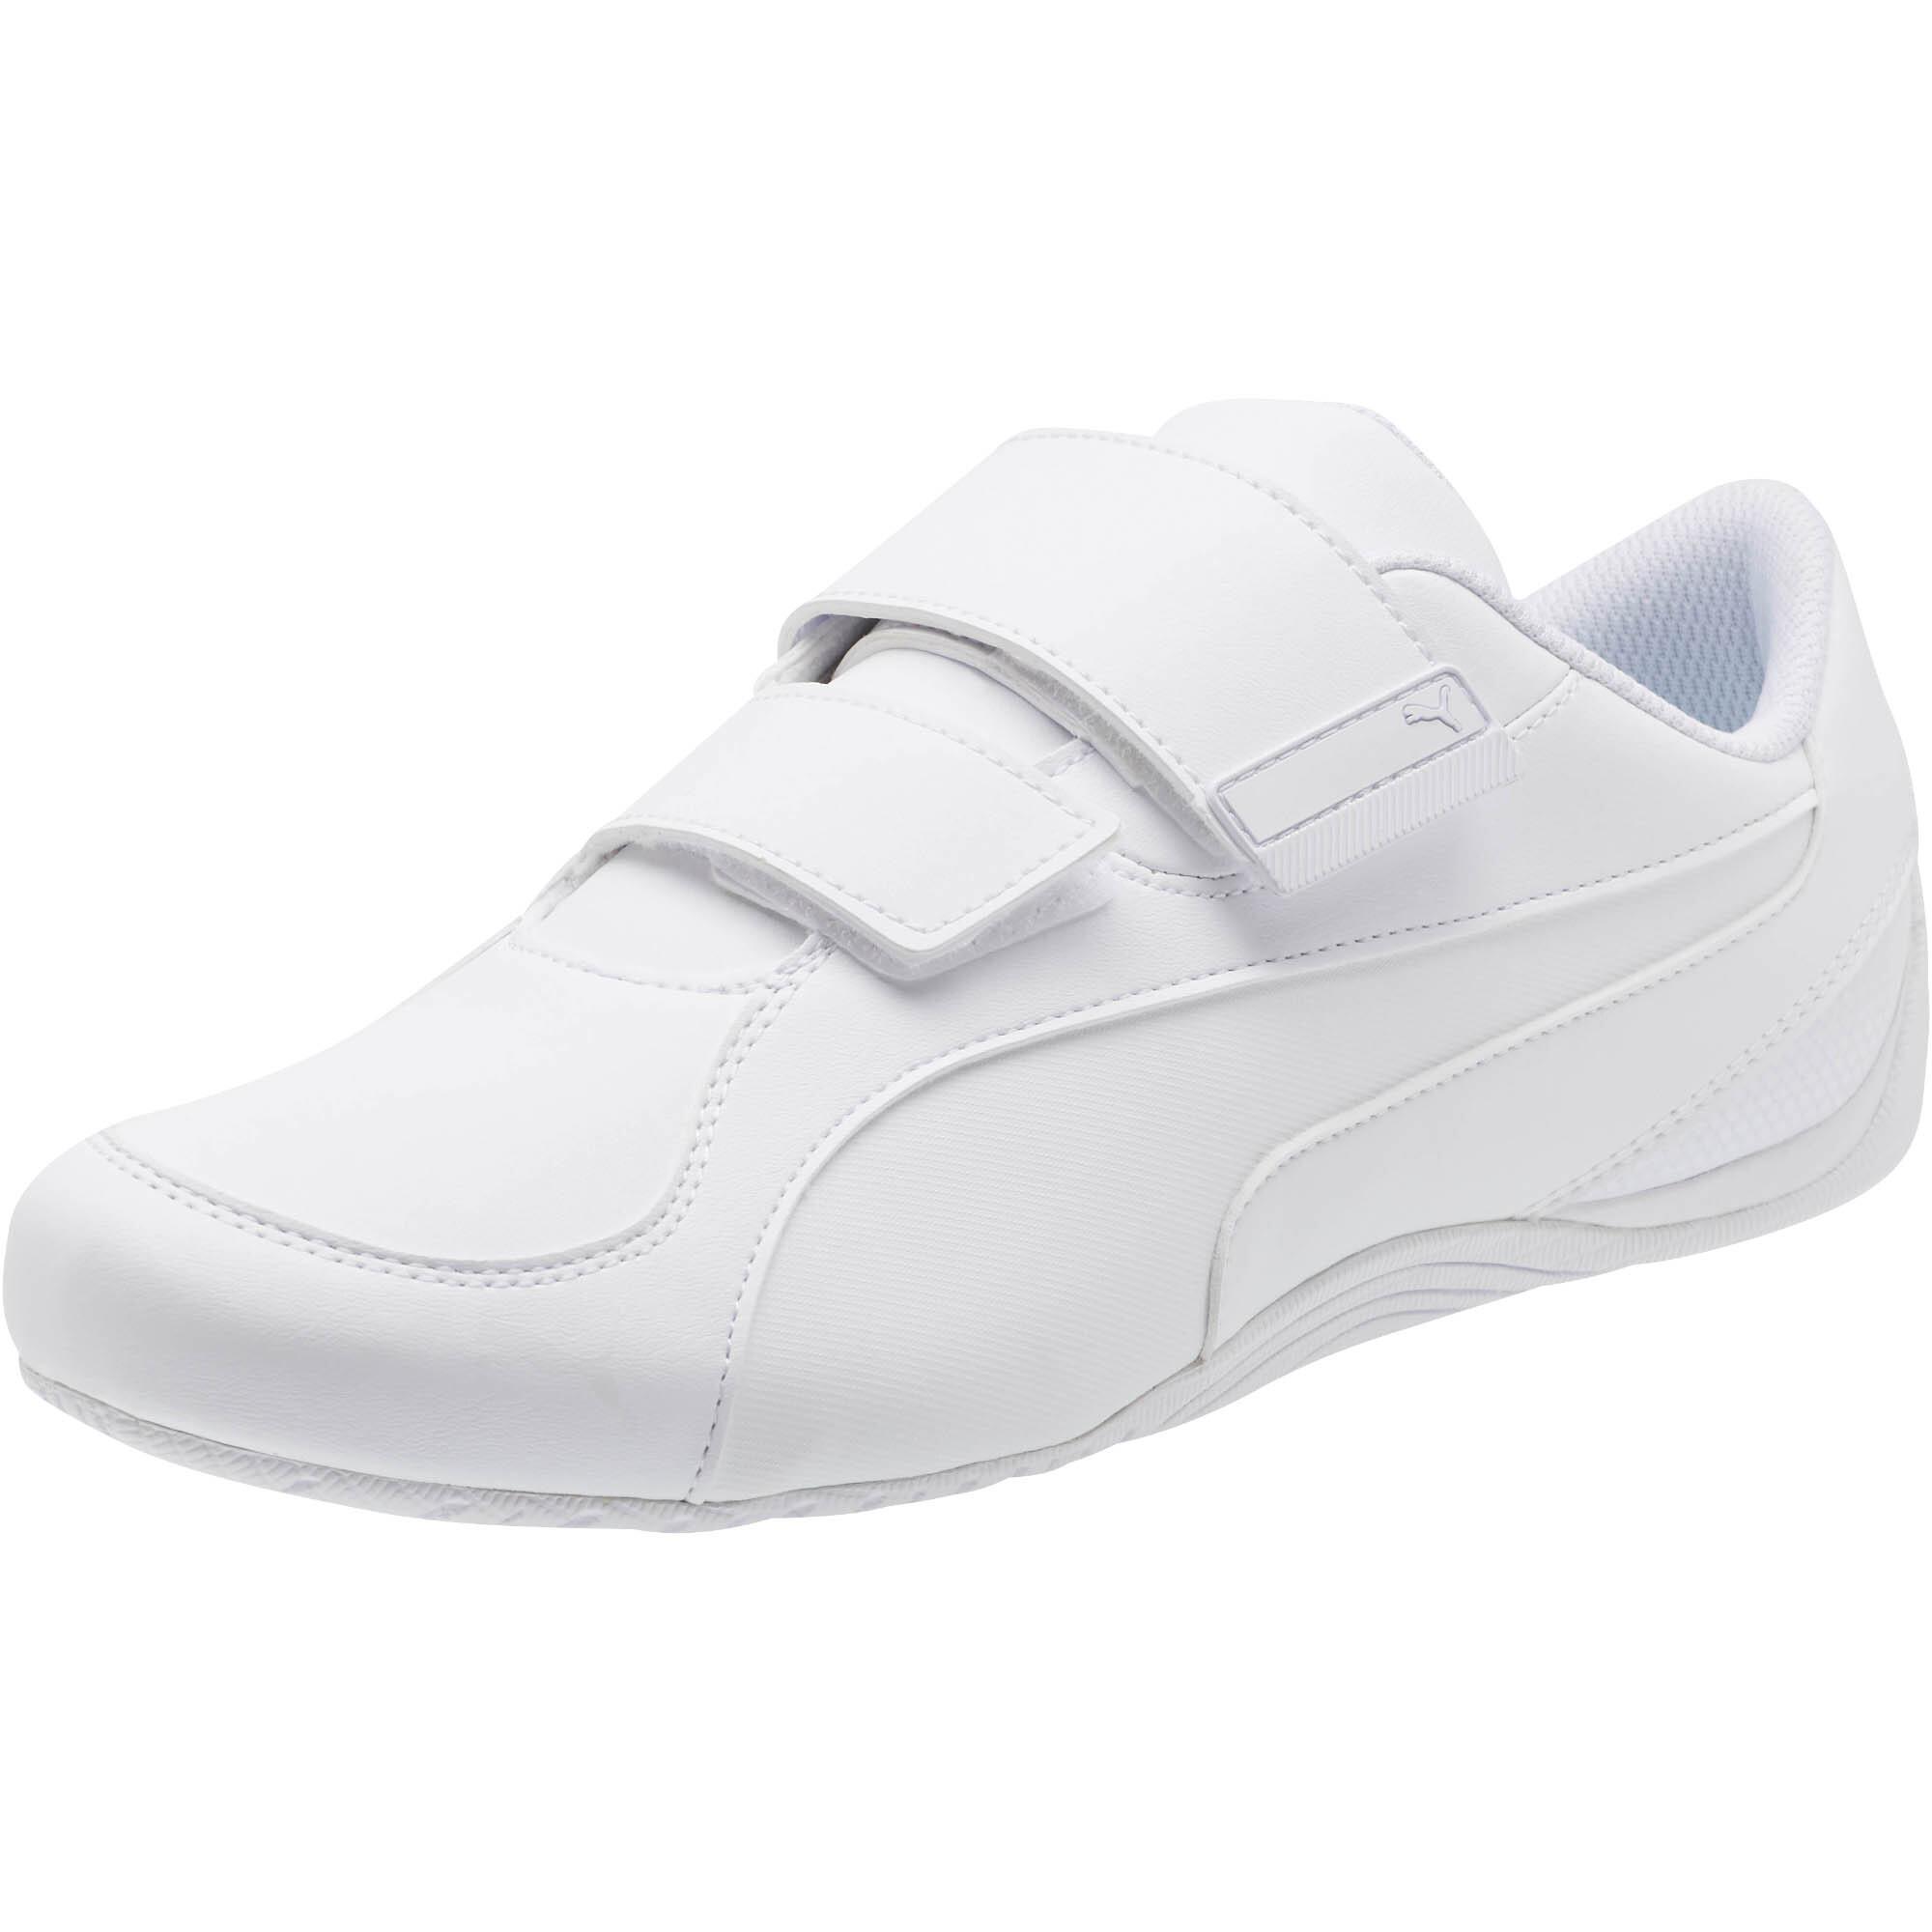 PUMA-Drift-Cat-5-AC-Men-039-s-Shoes-Unisex-Shoe-Basics miniatura 4